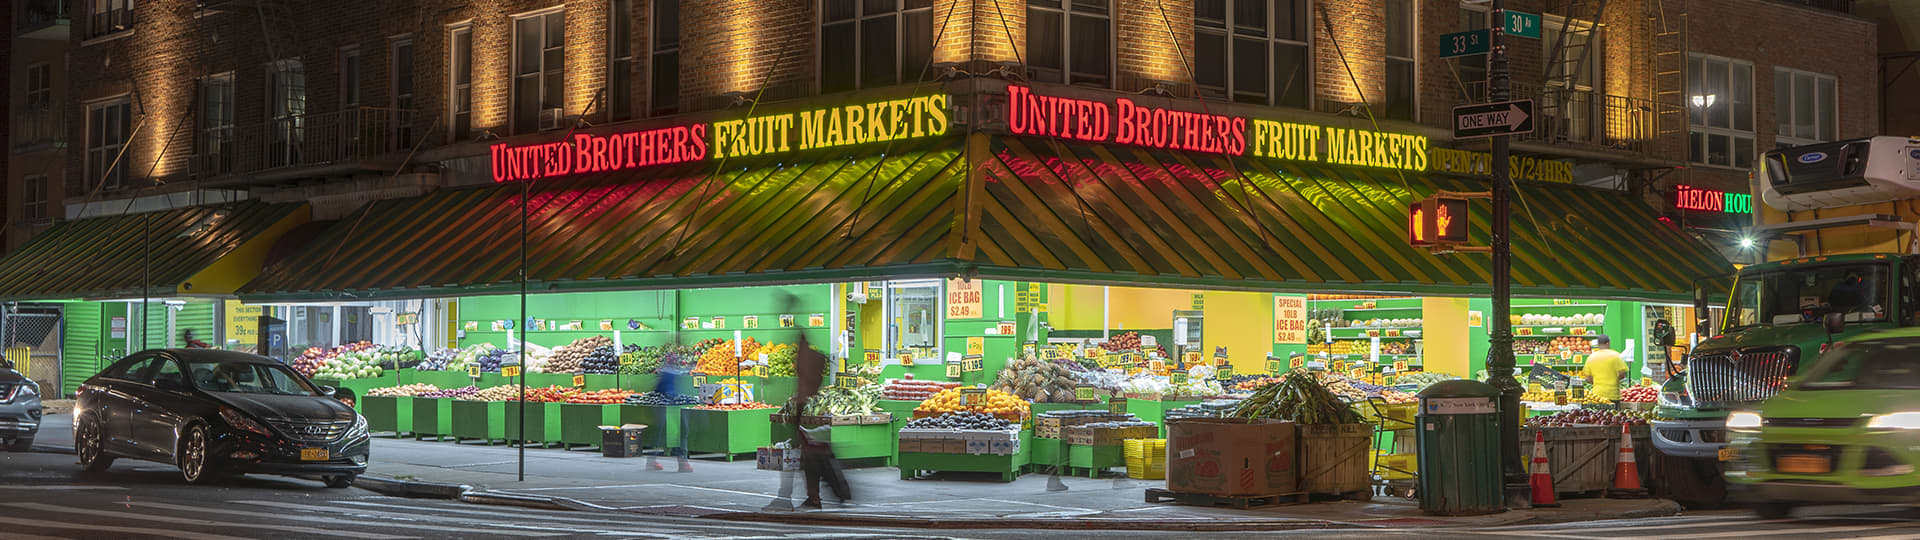 United Brothers Fruit Market, Astoria, Queens